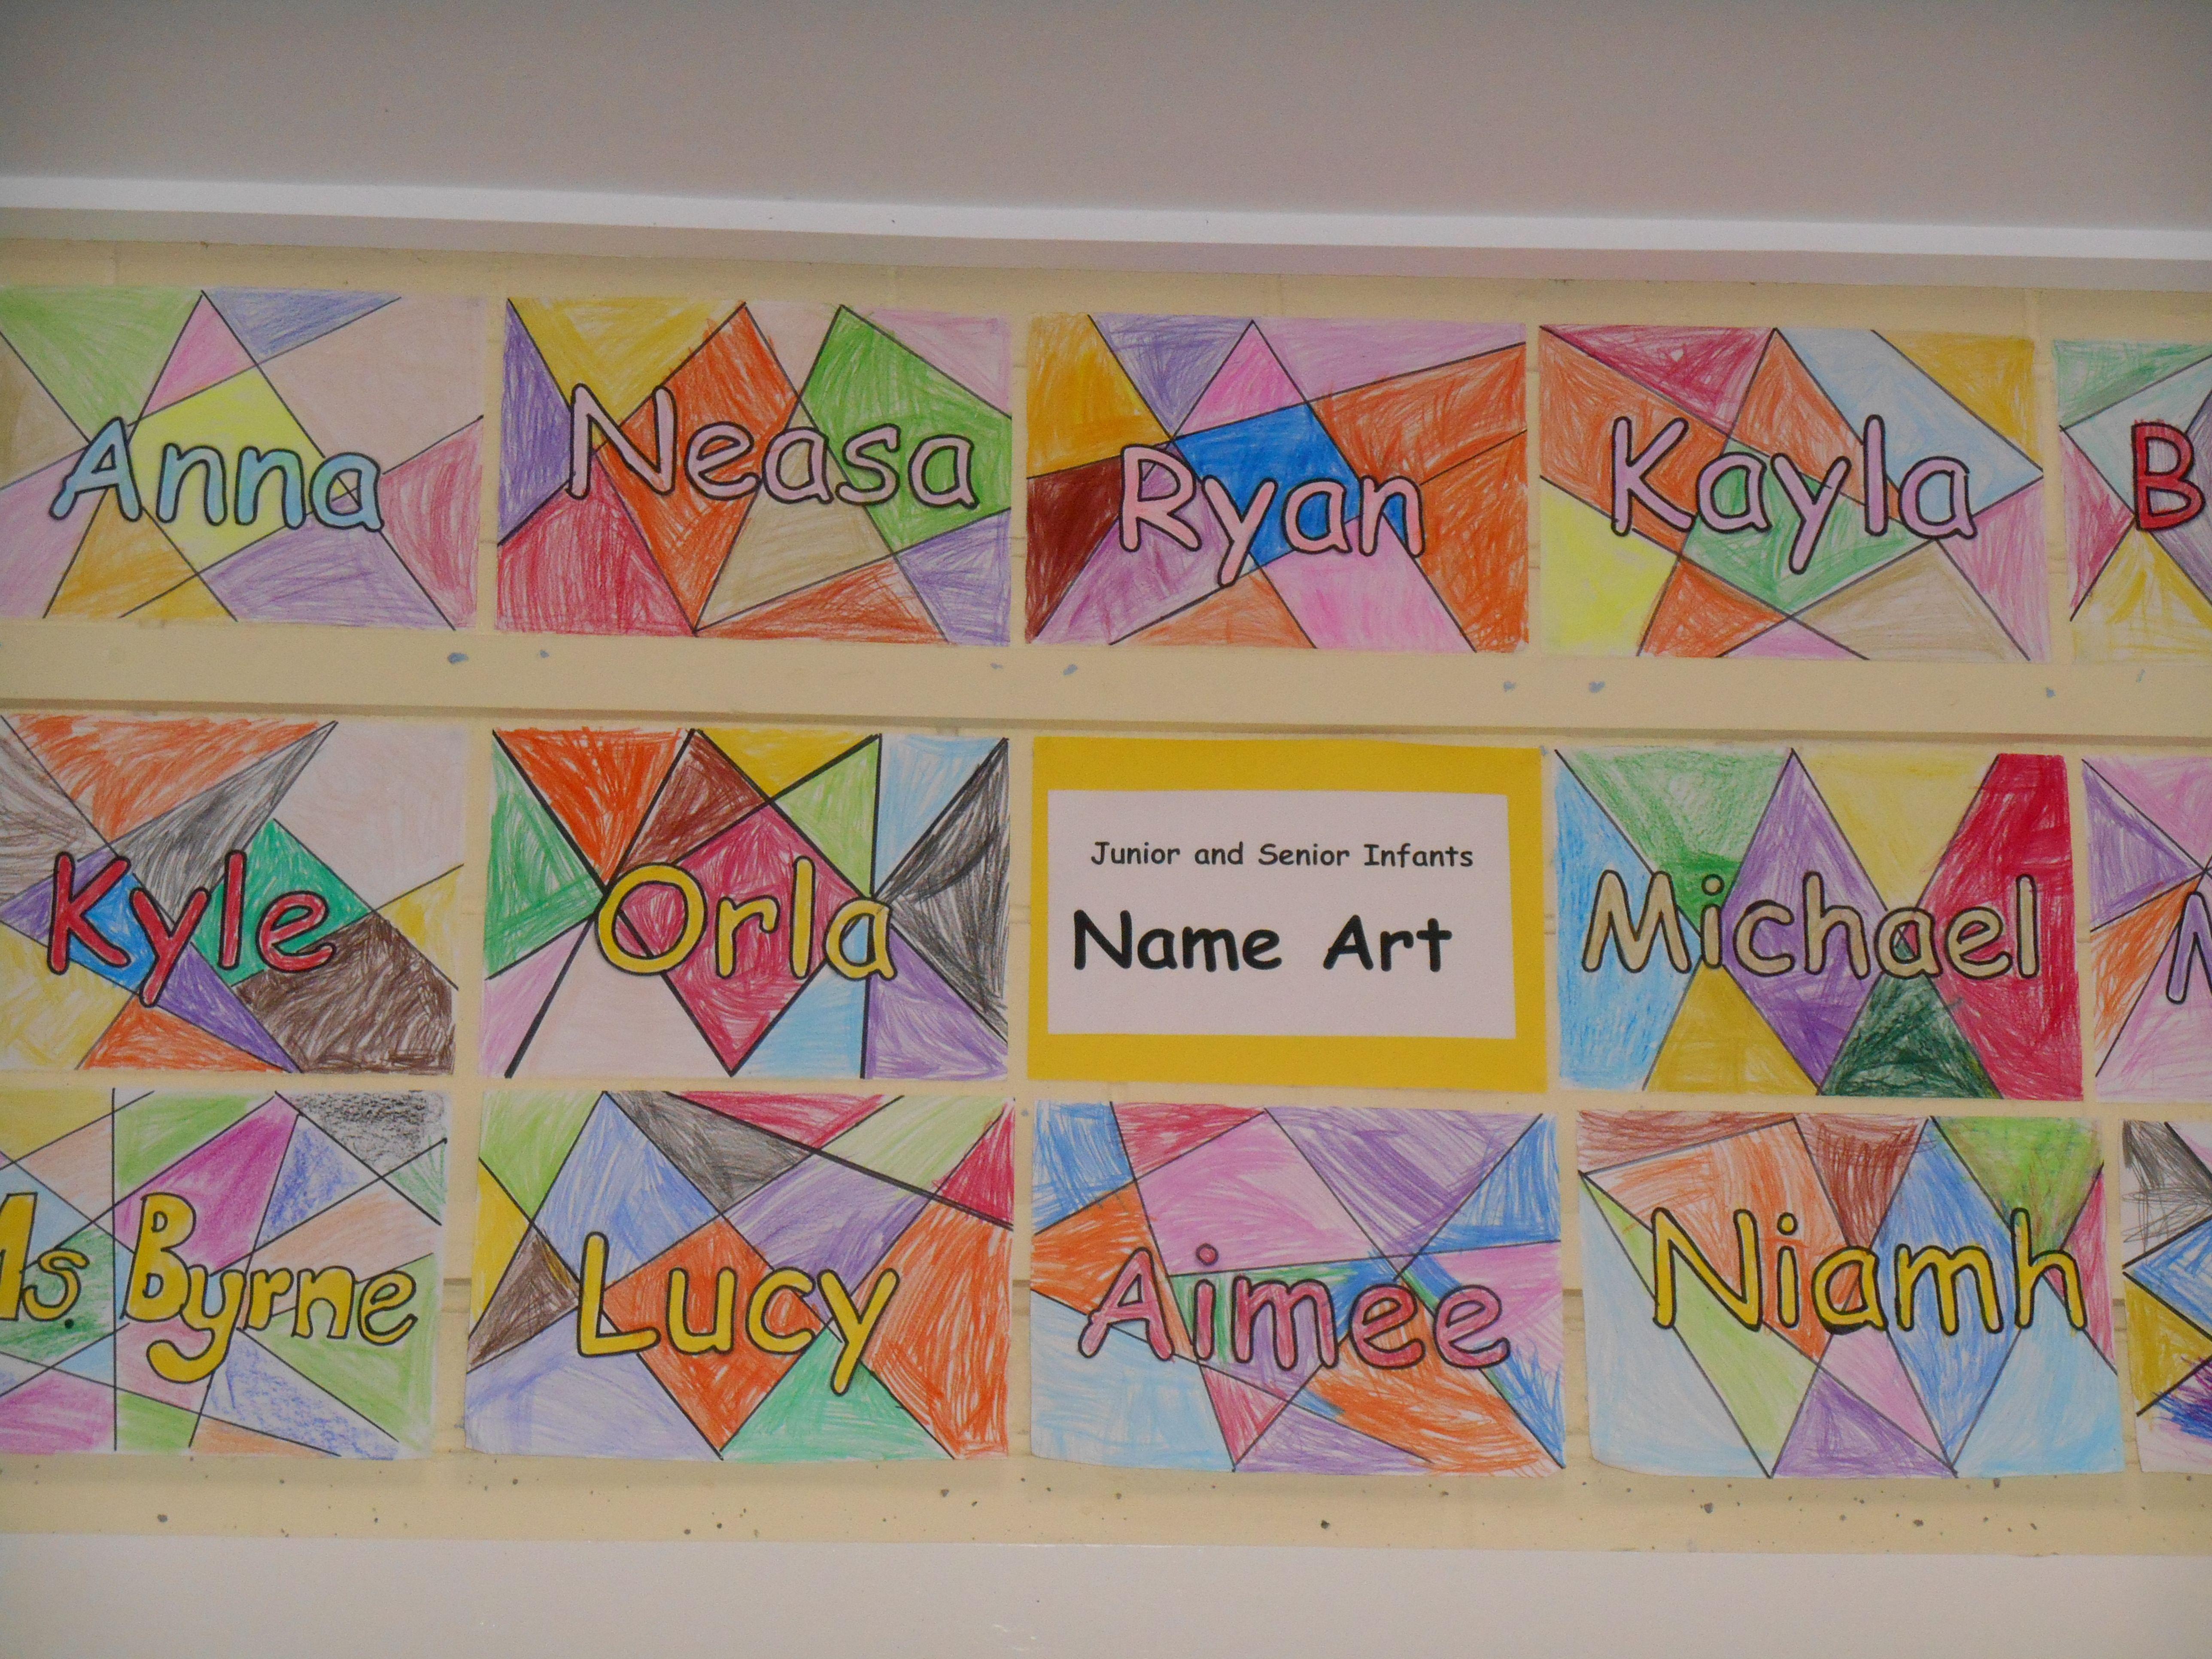 senior infants art - Google Search